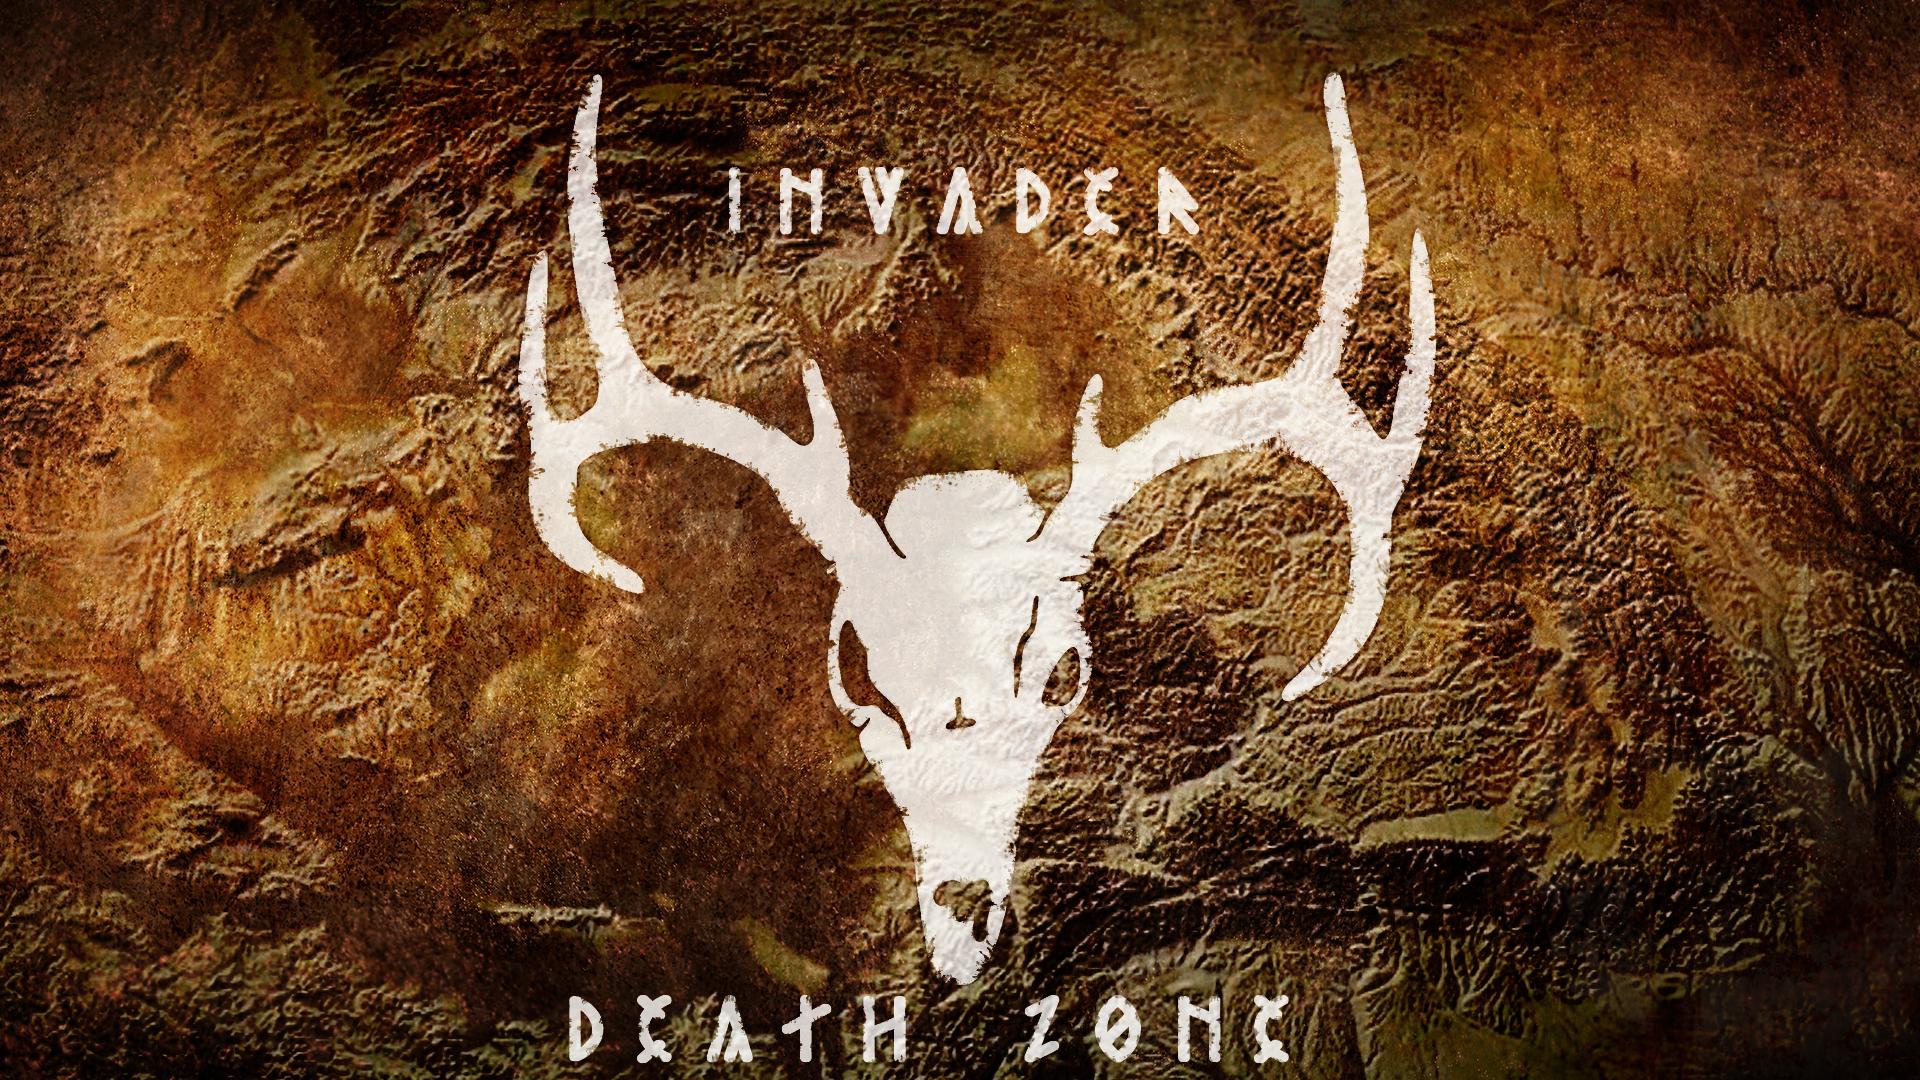 invader_dead_zone_03.jpg